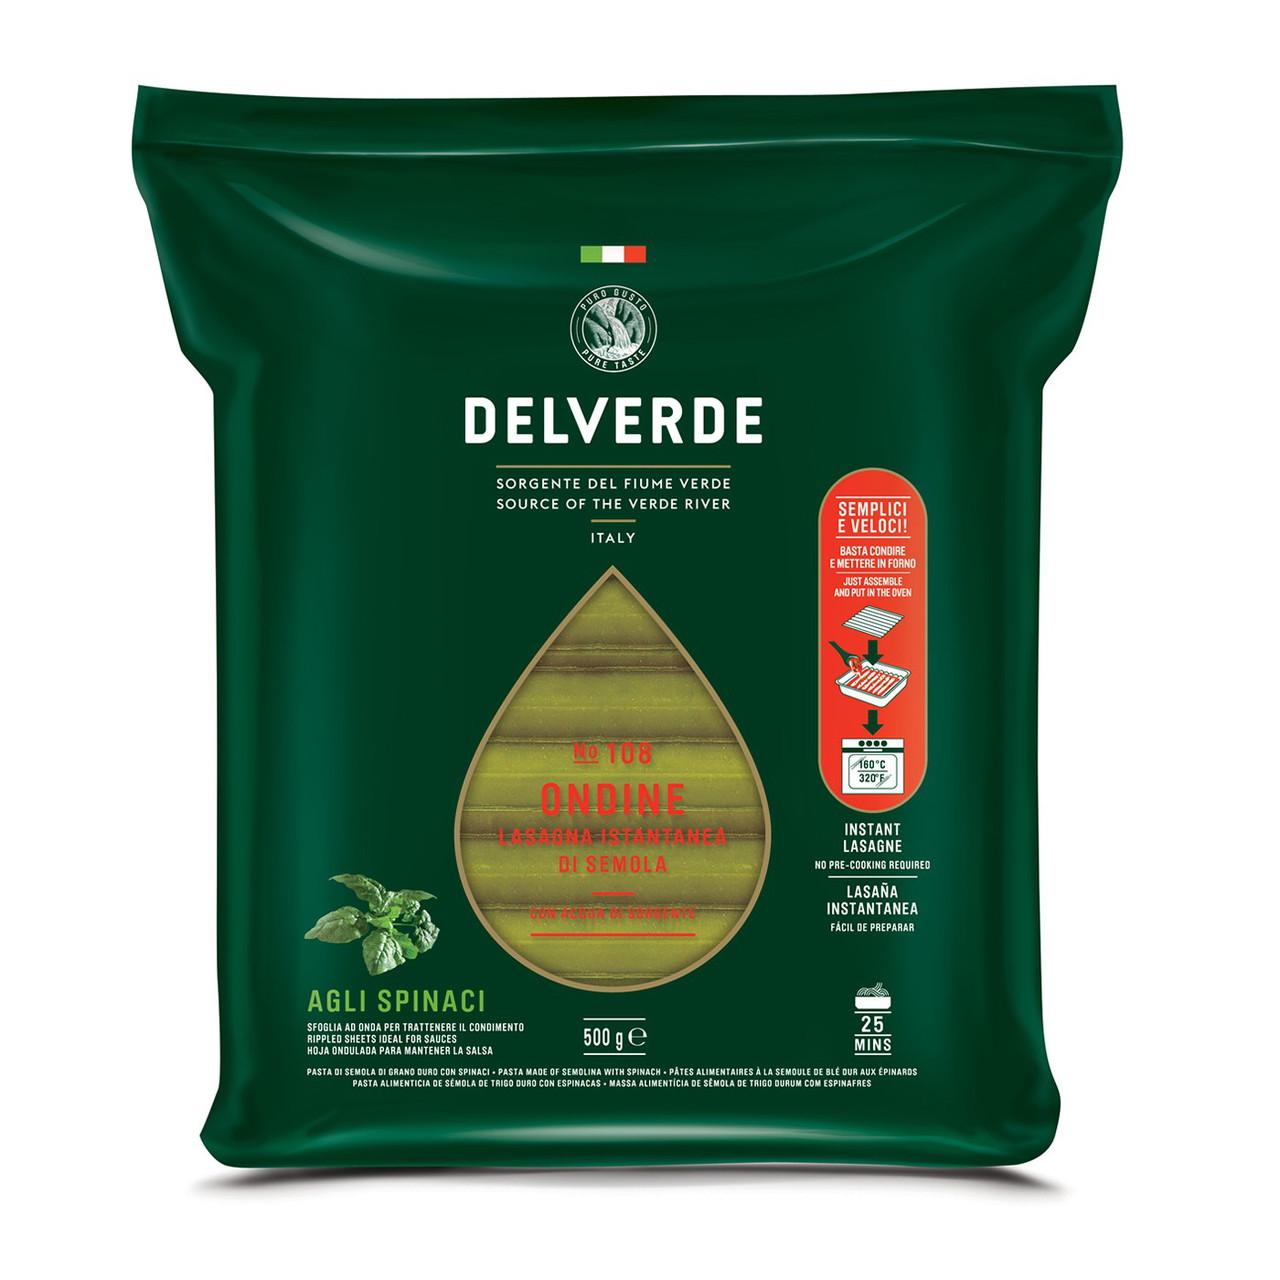 Листы лазаньи (макароны) Delverde Ondine Agli Spinaci